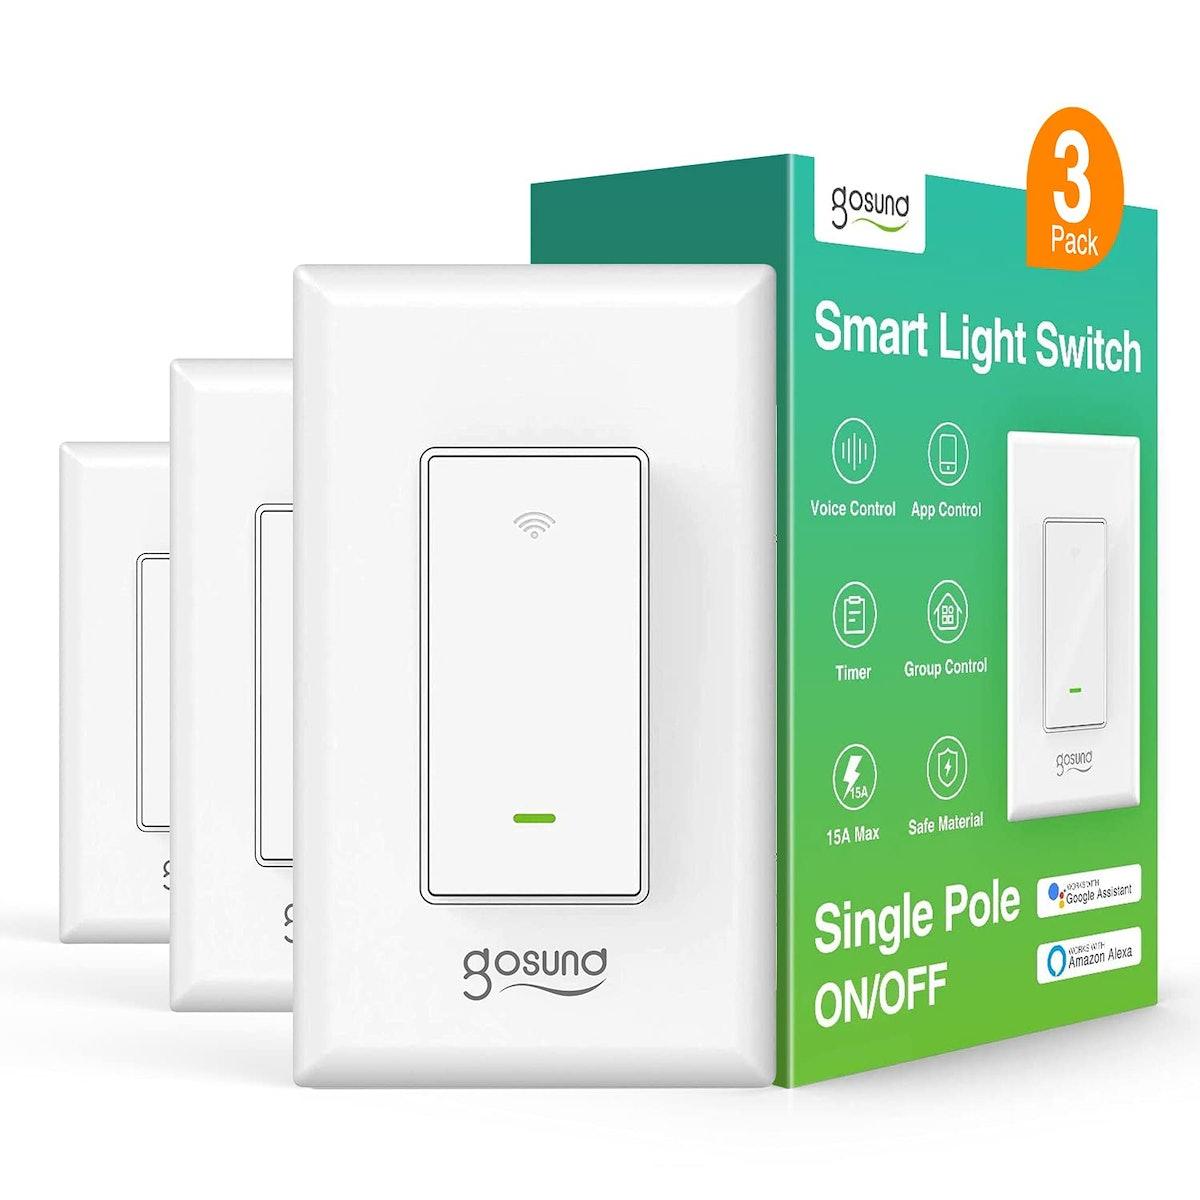 Gosund Smart Light Switch (3-Pack)